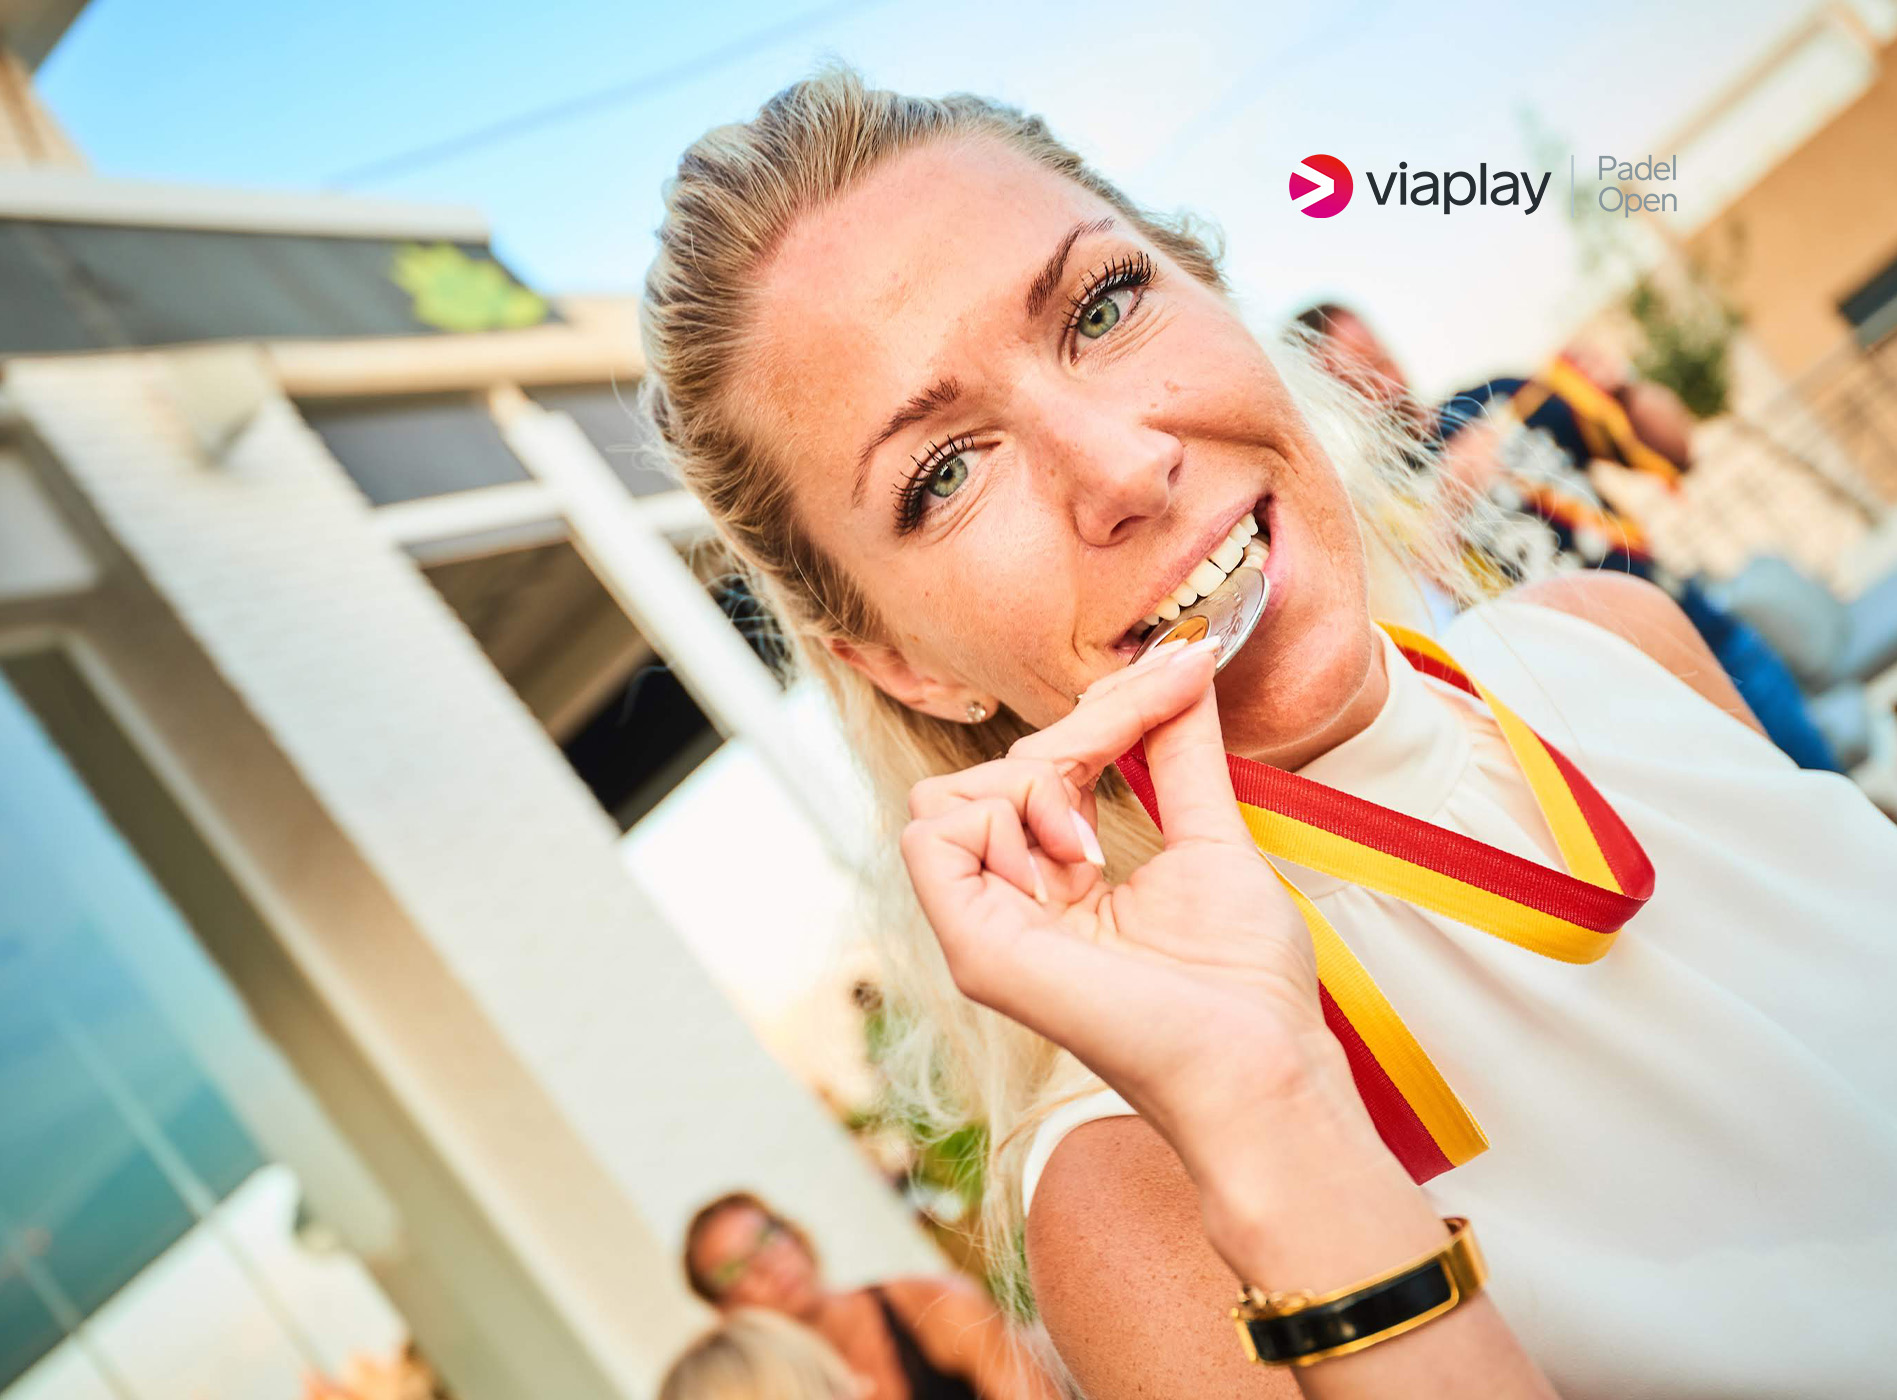 Viaplay Padel Open 2020 Huvudturnering Damer